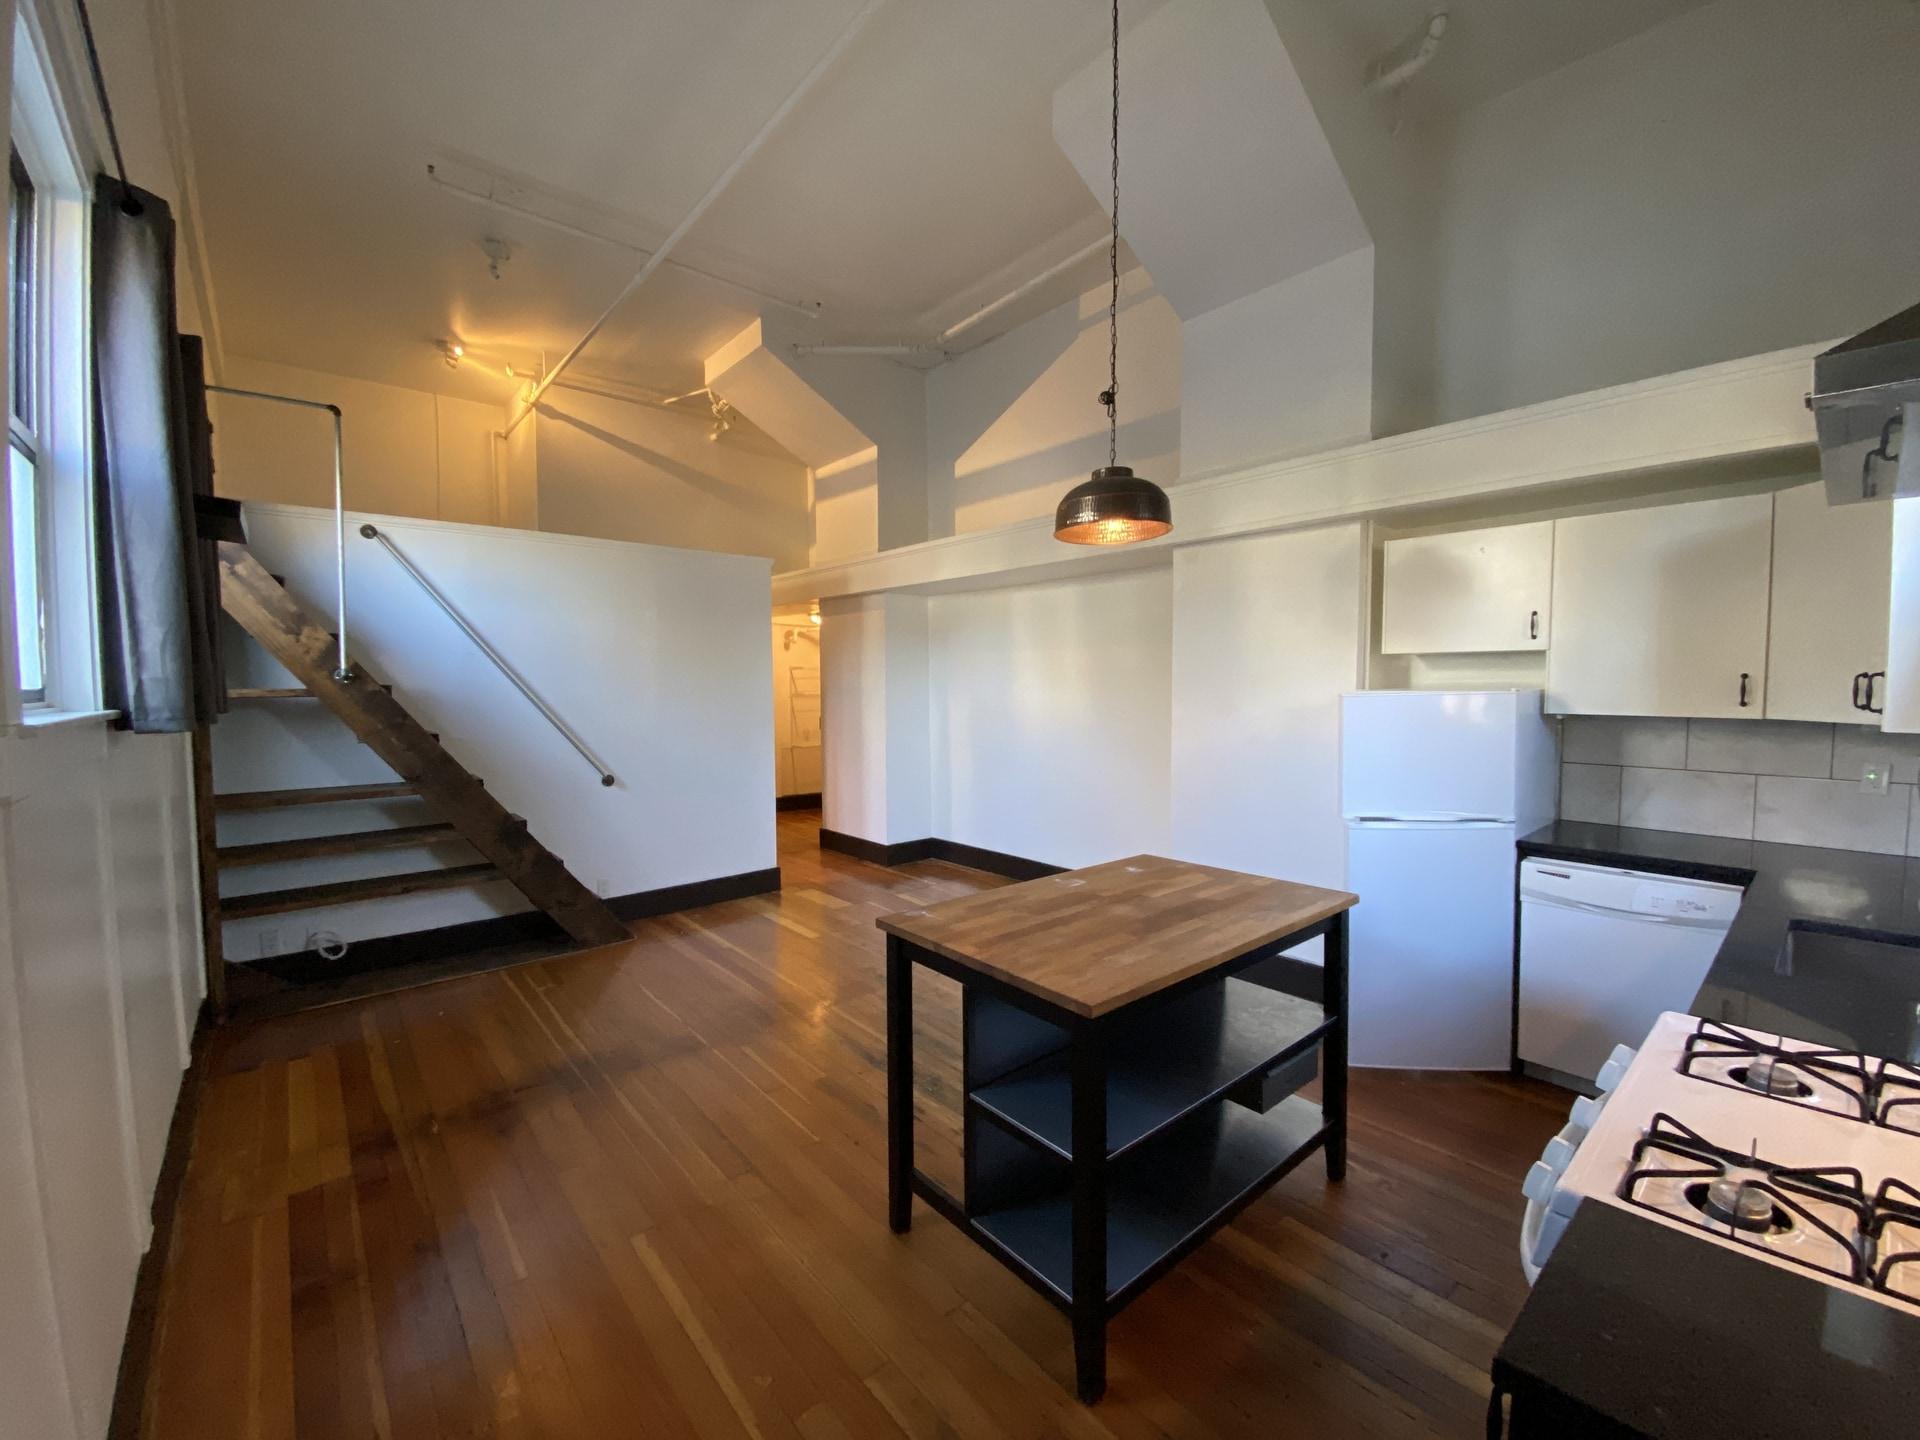 Unique Townhouse-Style 1 bed + Loft! FREE Utilities!